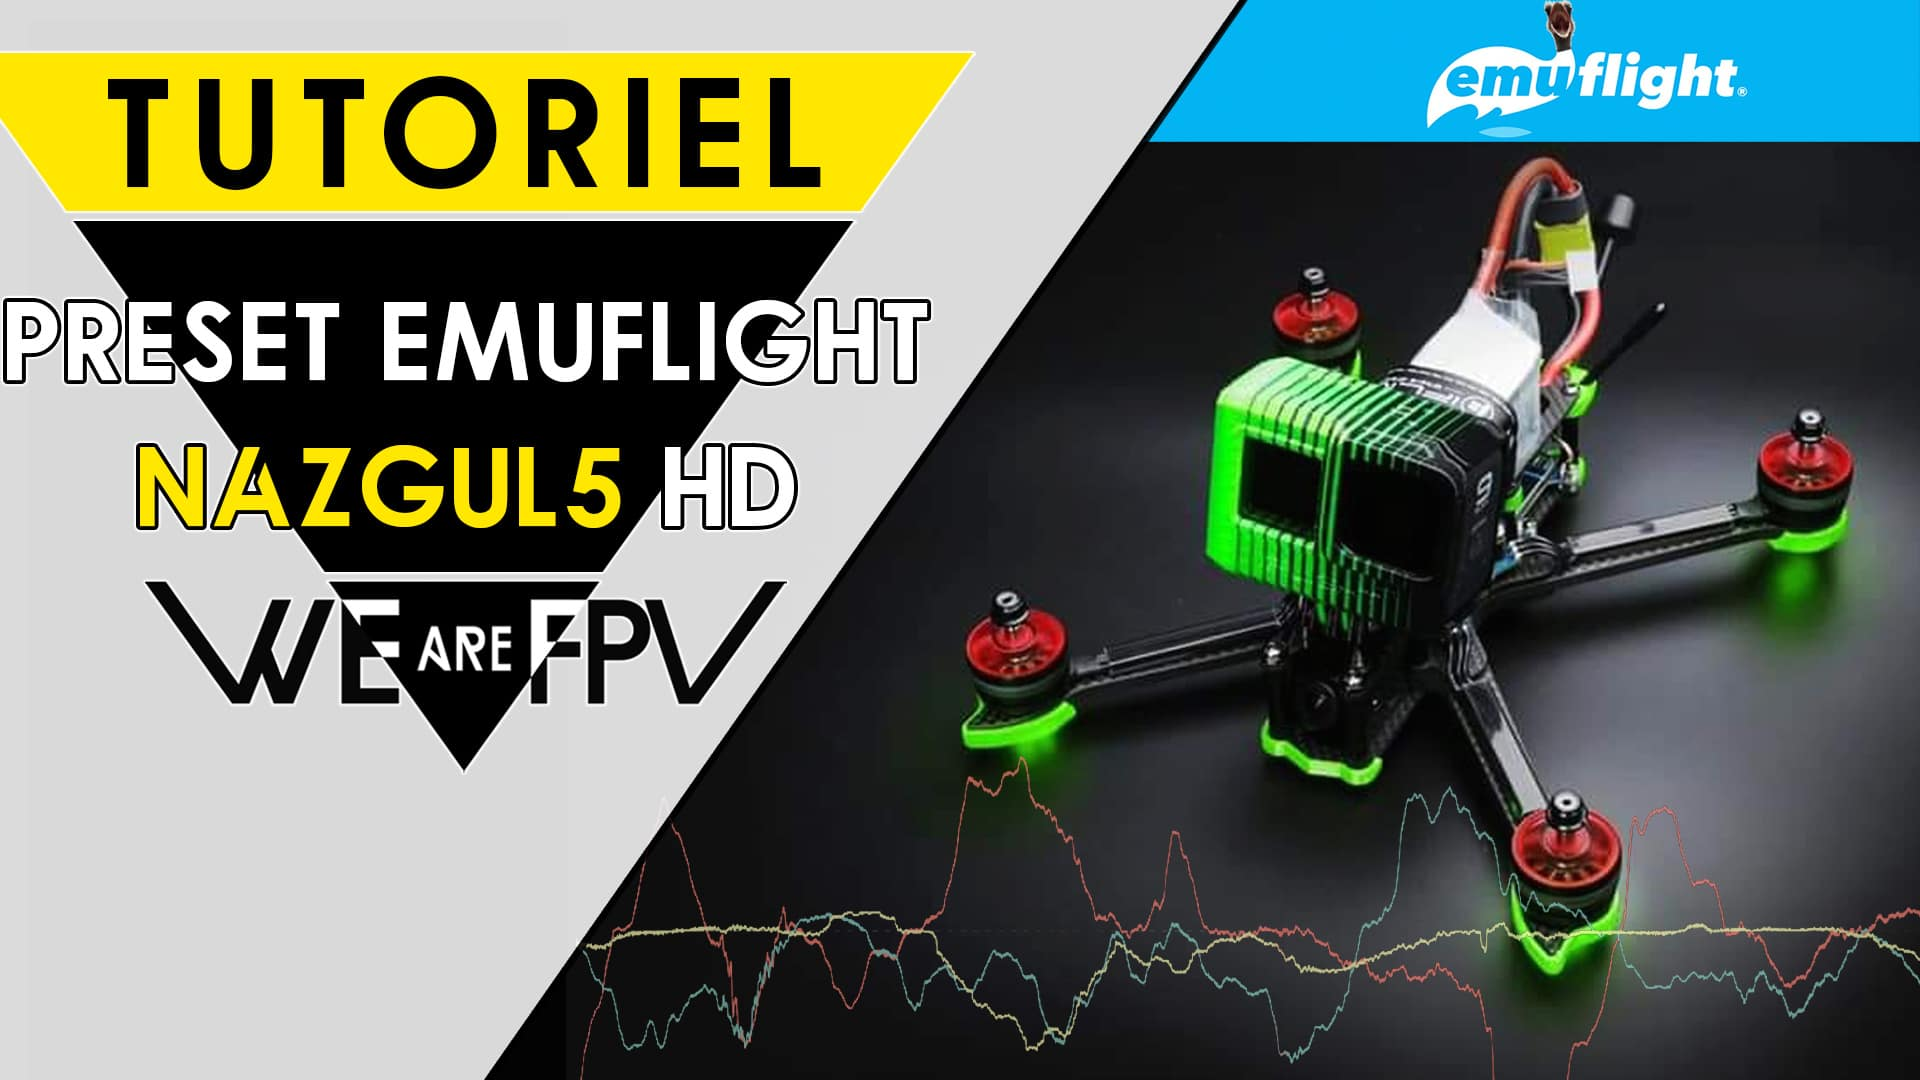 preset emuflight nazgul5 hd v2